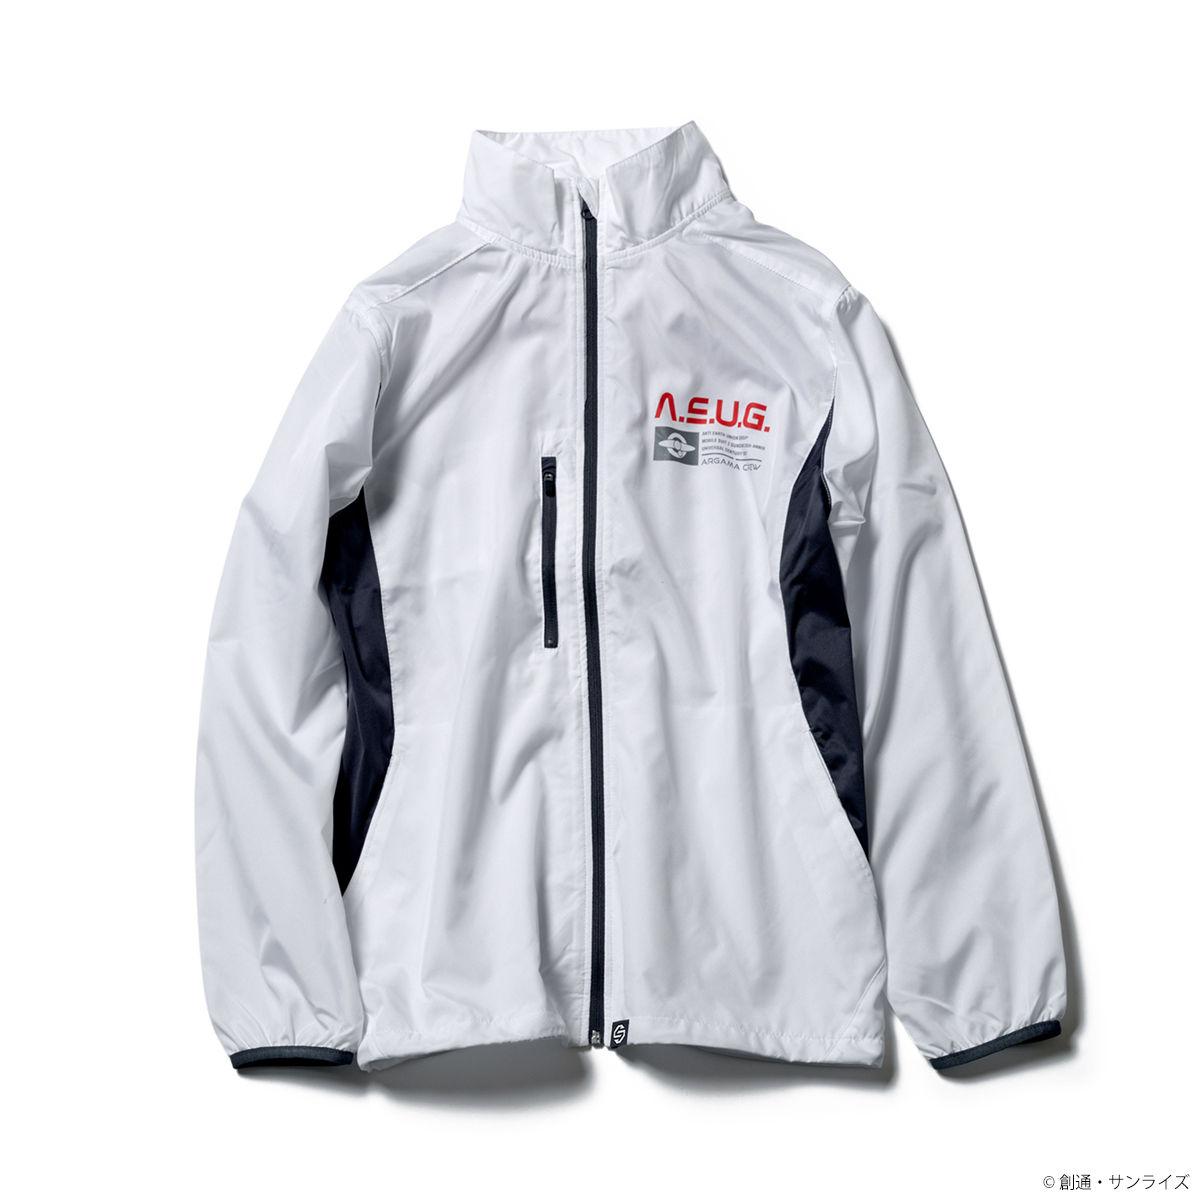 Argama Jacket—Mobile Suit Zeta Gundam/STRICT-G Collaboration